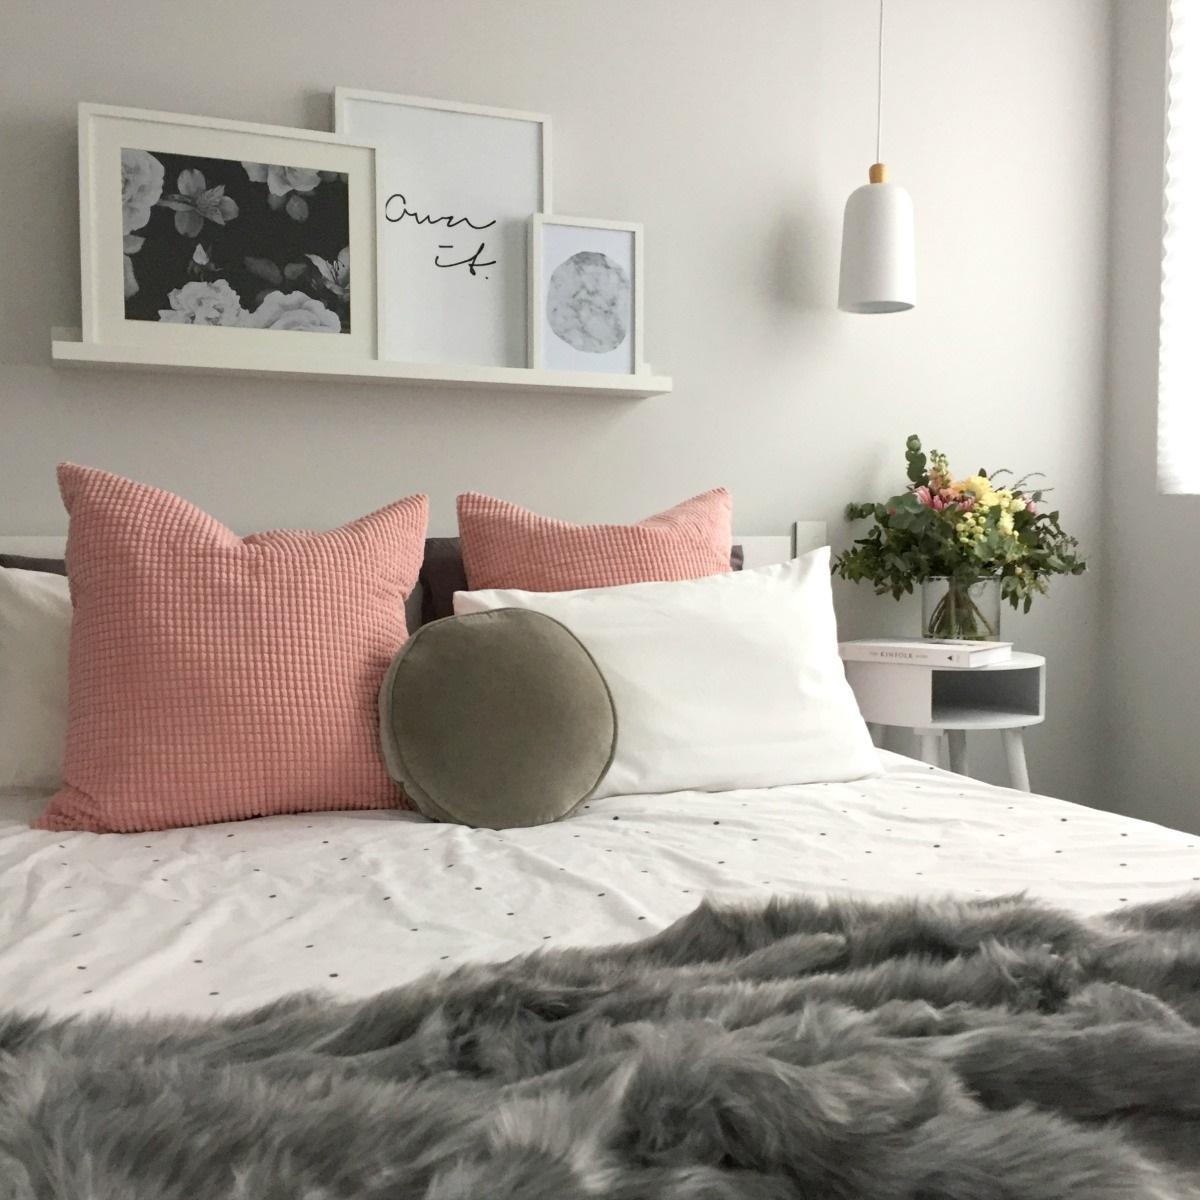 Suri fur comforter, luxury bedding in Dark Gray